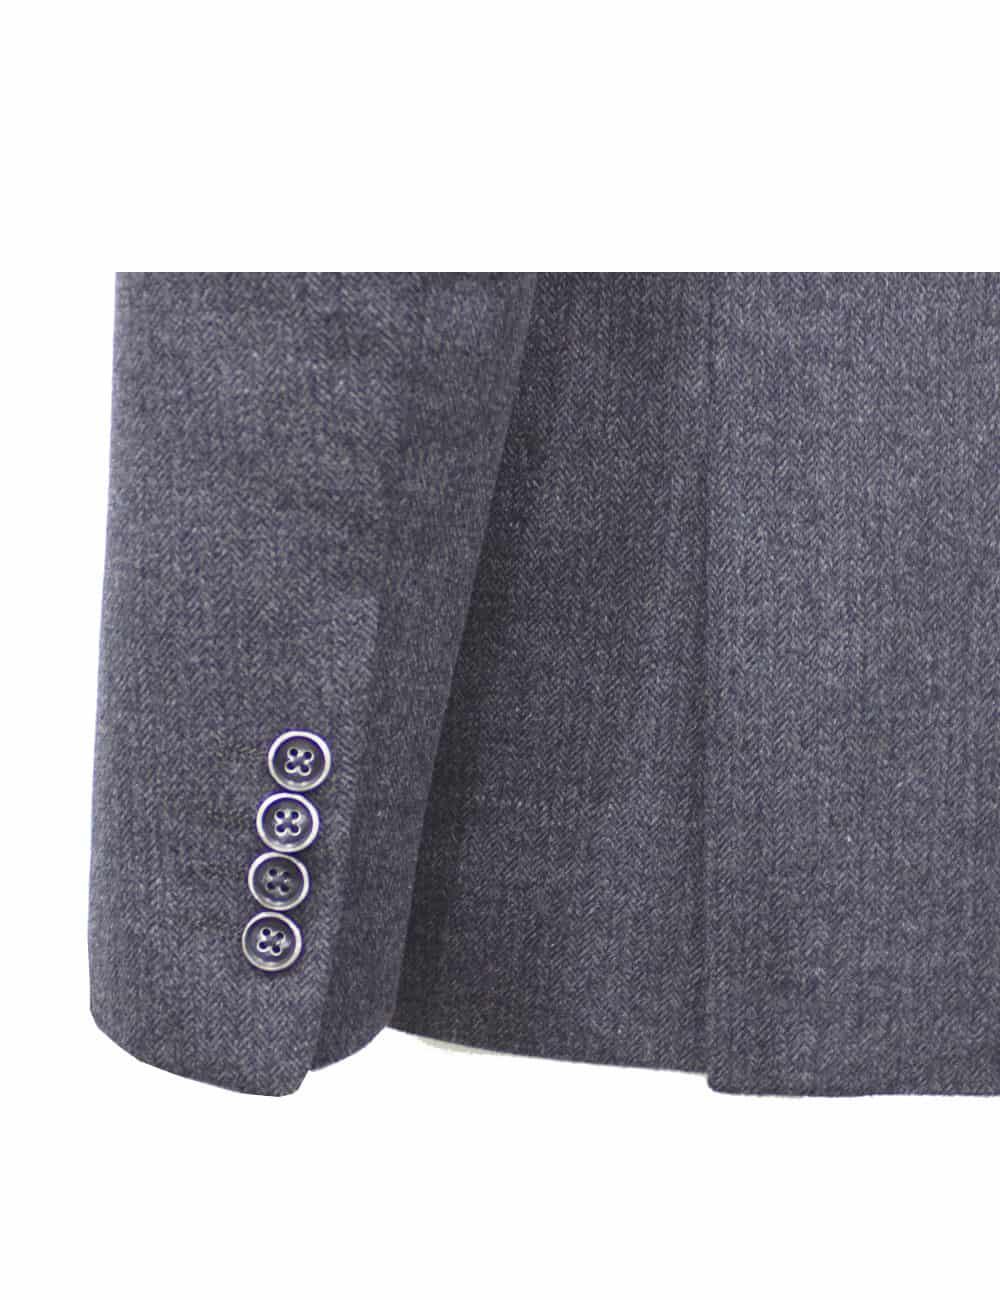 Slim Fit Grey Herringbone Blazer - B2B1.1